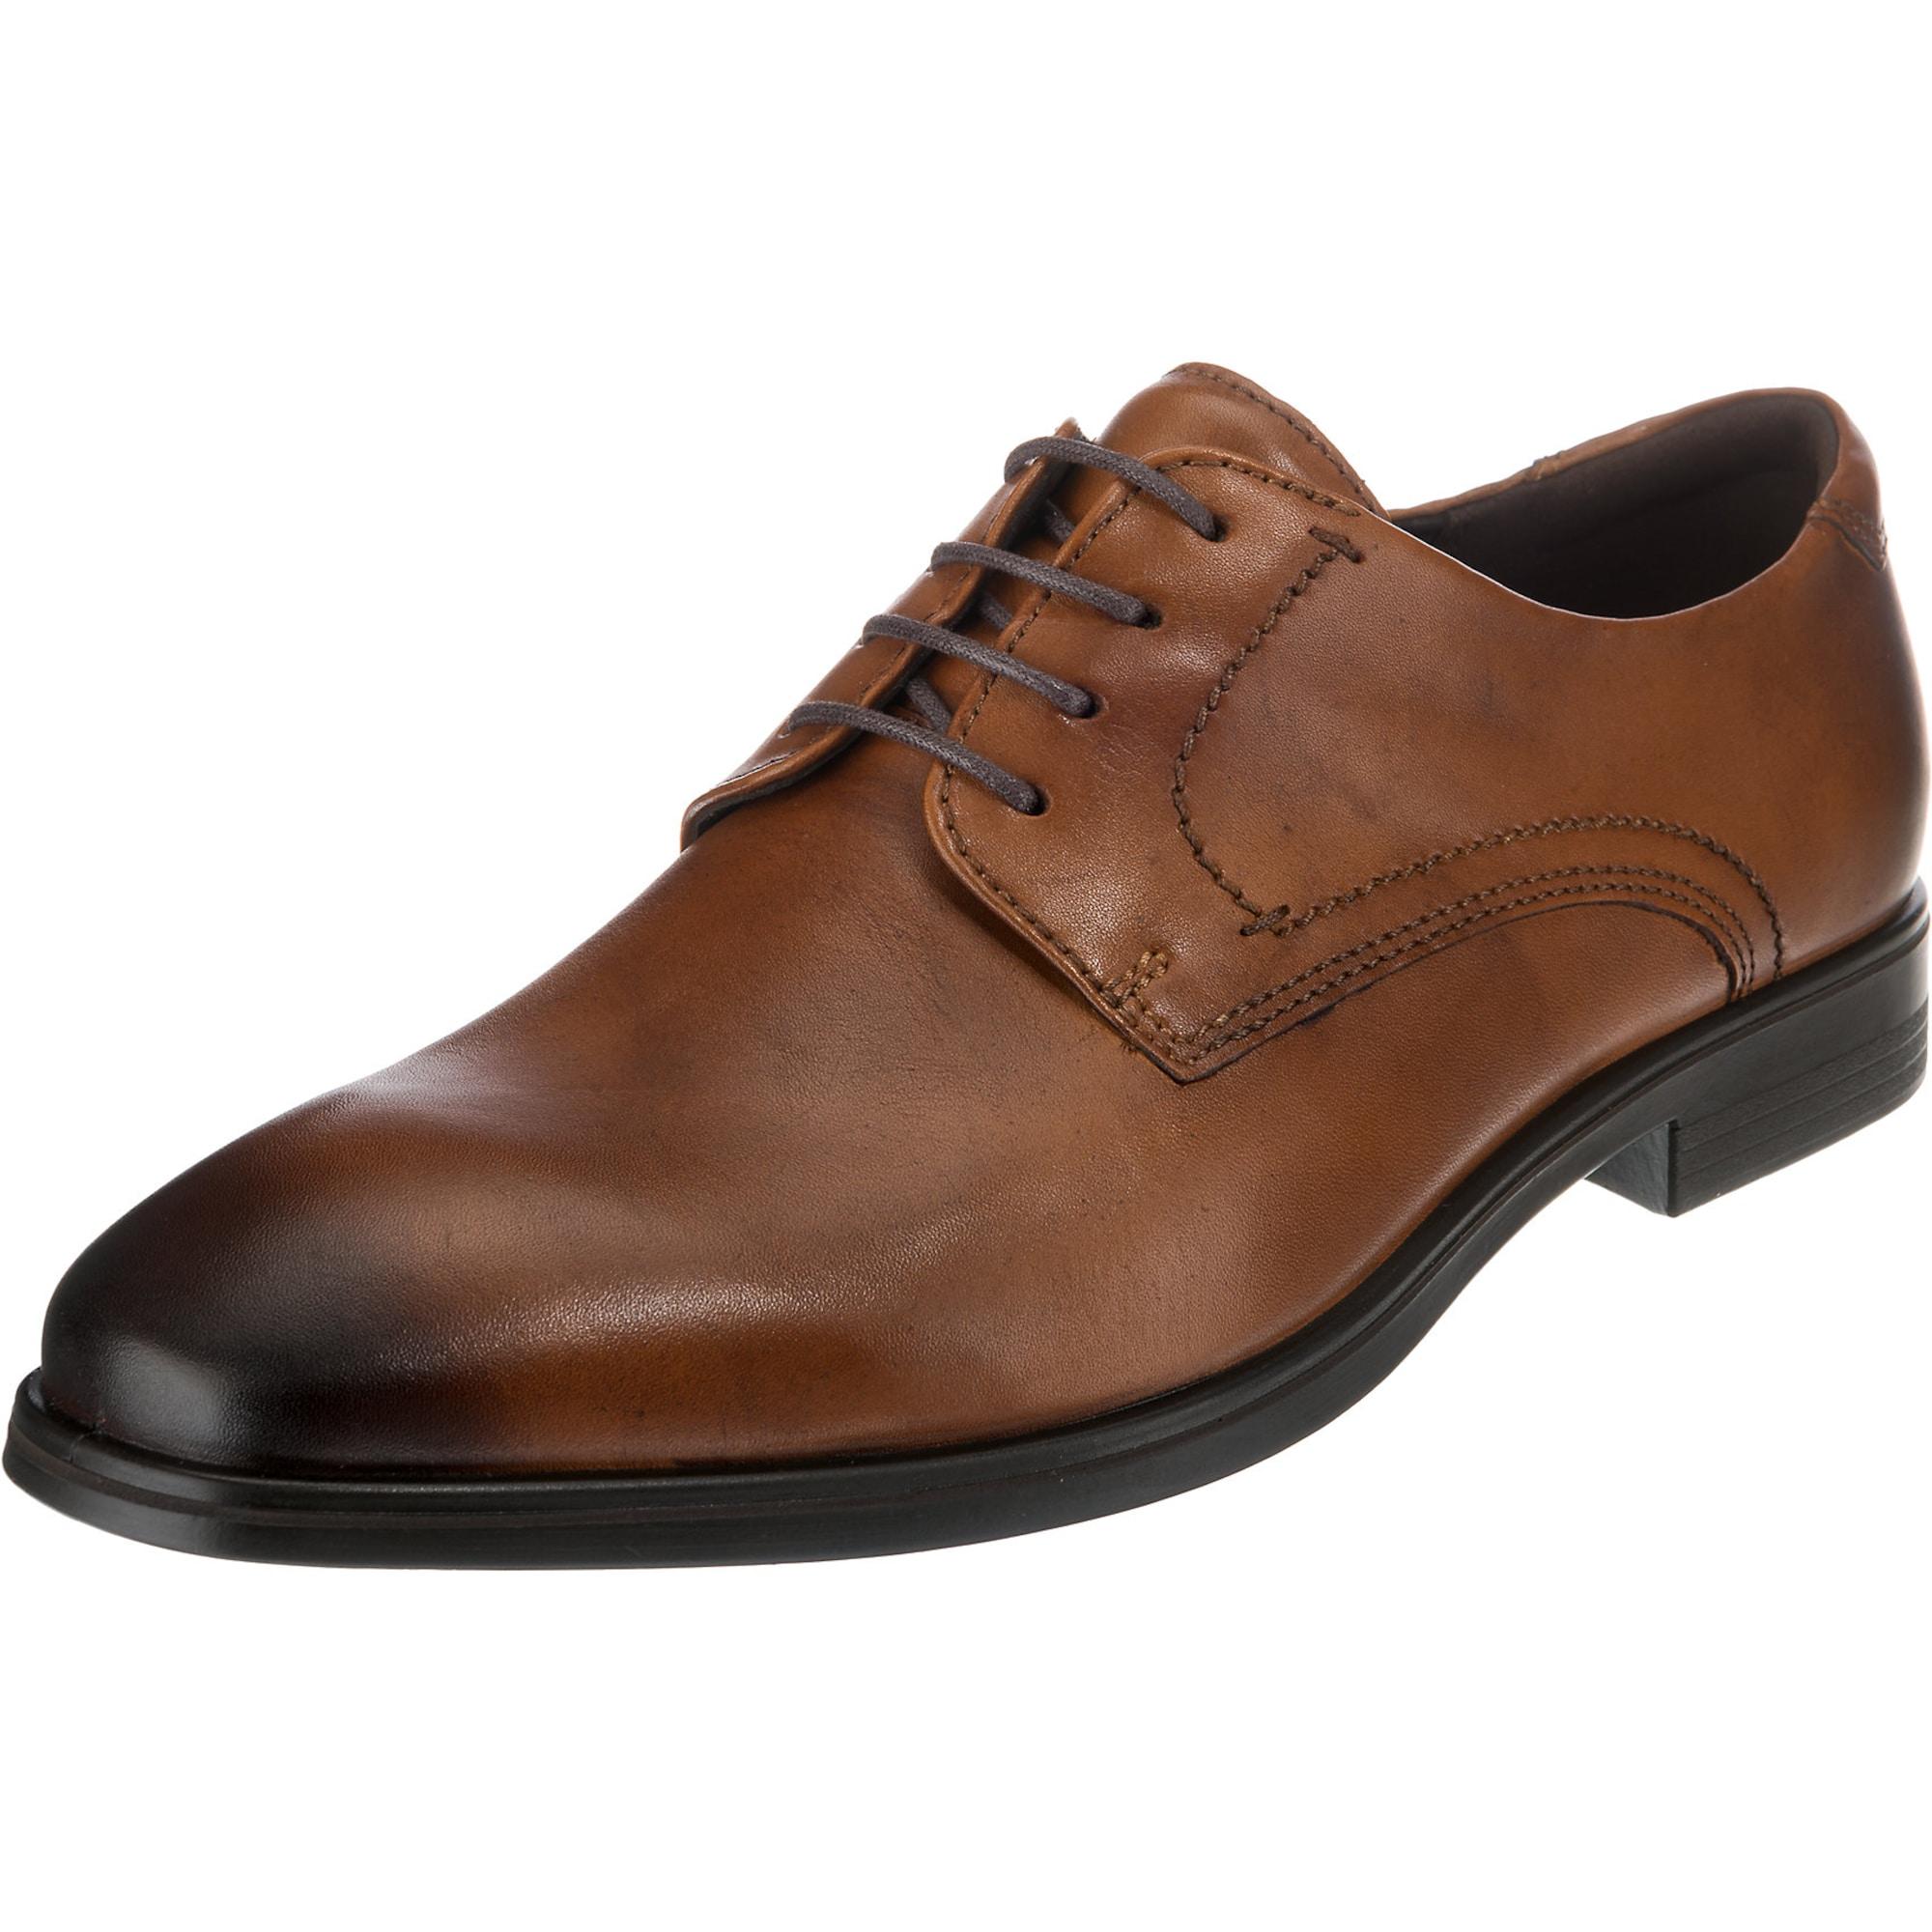 Šněrovací boty Melburne hnědá ECCO